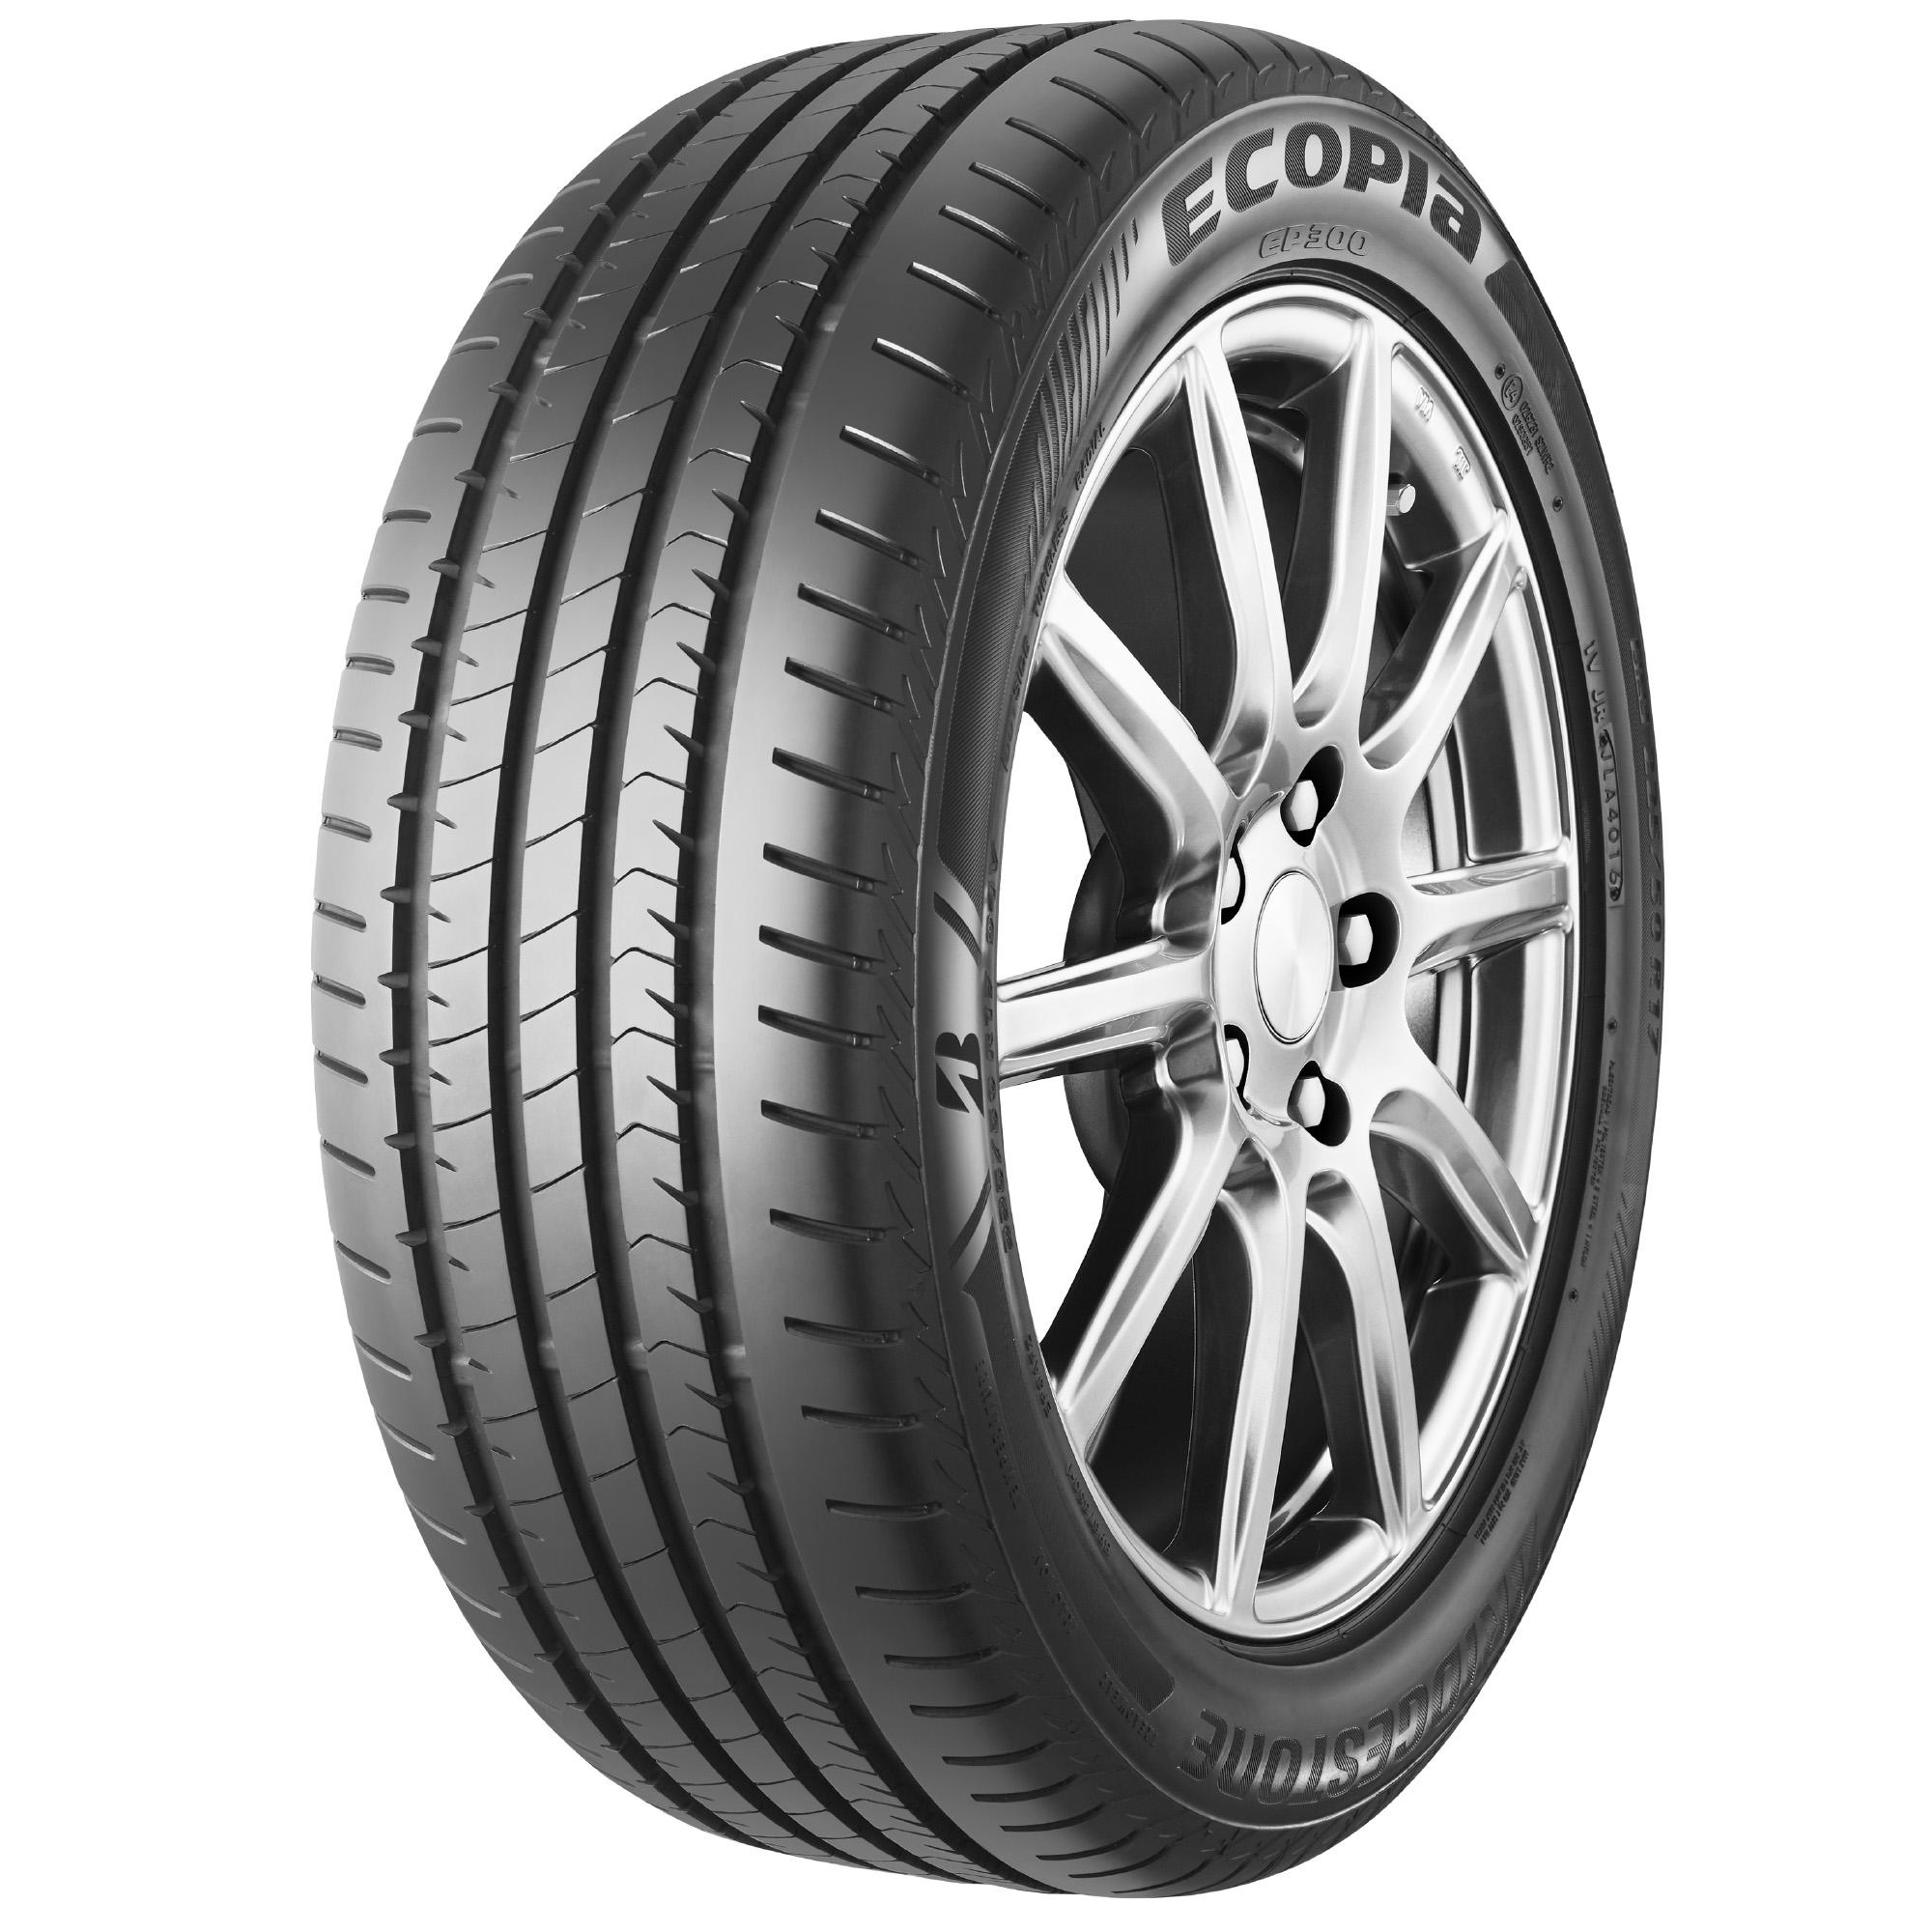 Bridgestone Ecopia Tyre Fuel Saving Bridgestone Singapore